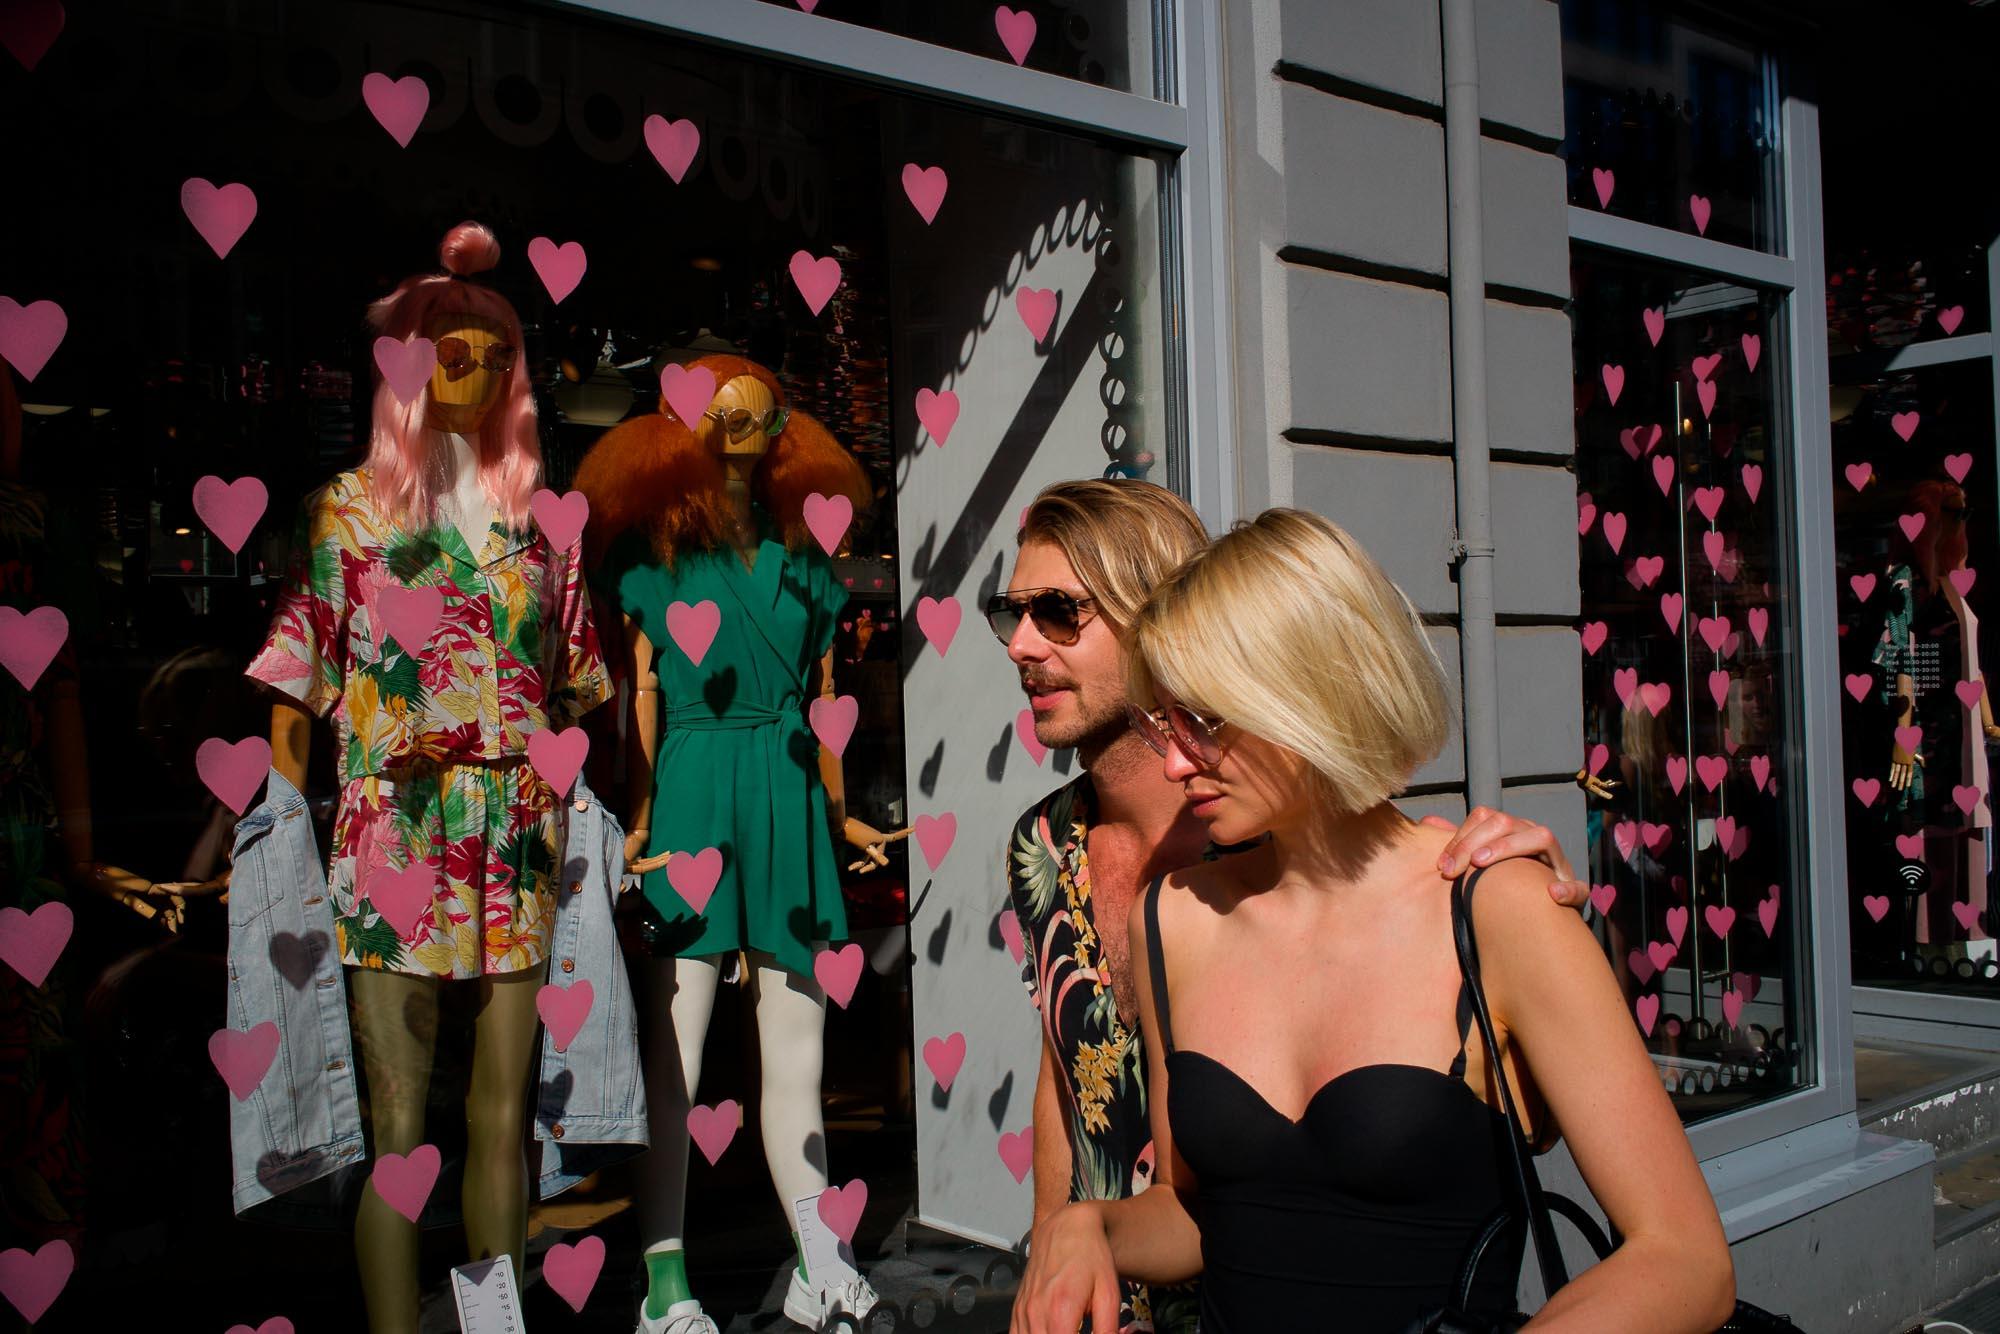 Street Photography Berlin sven kraeuter